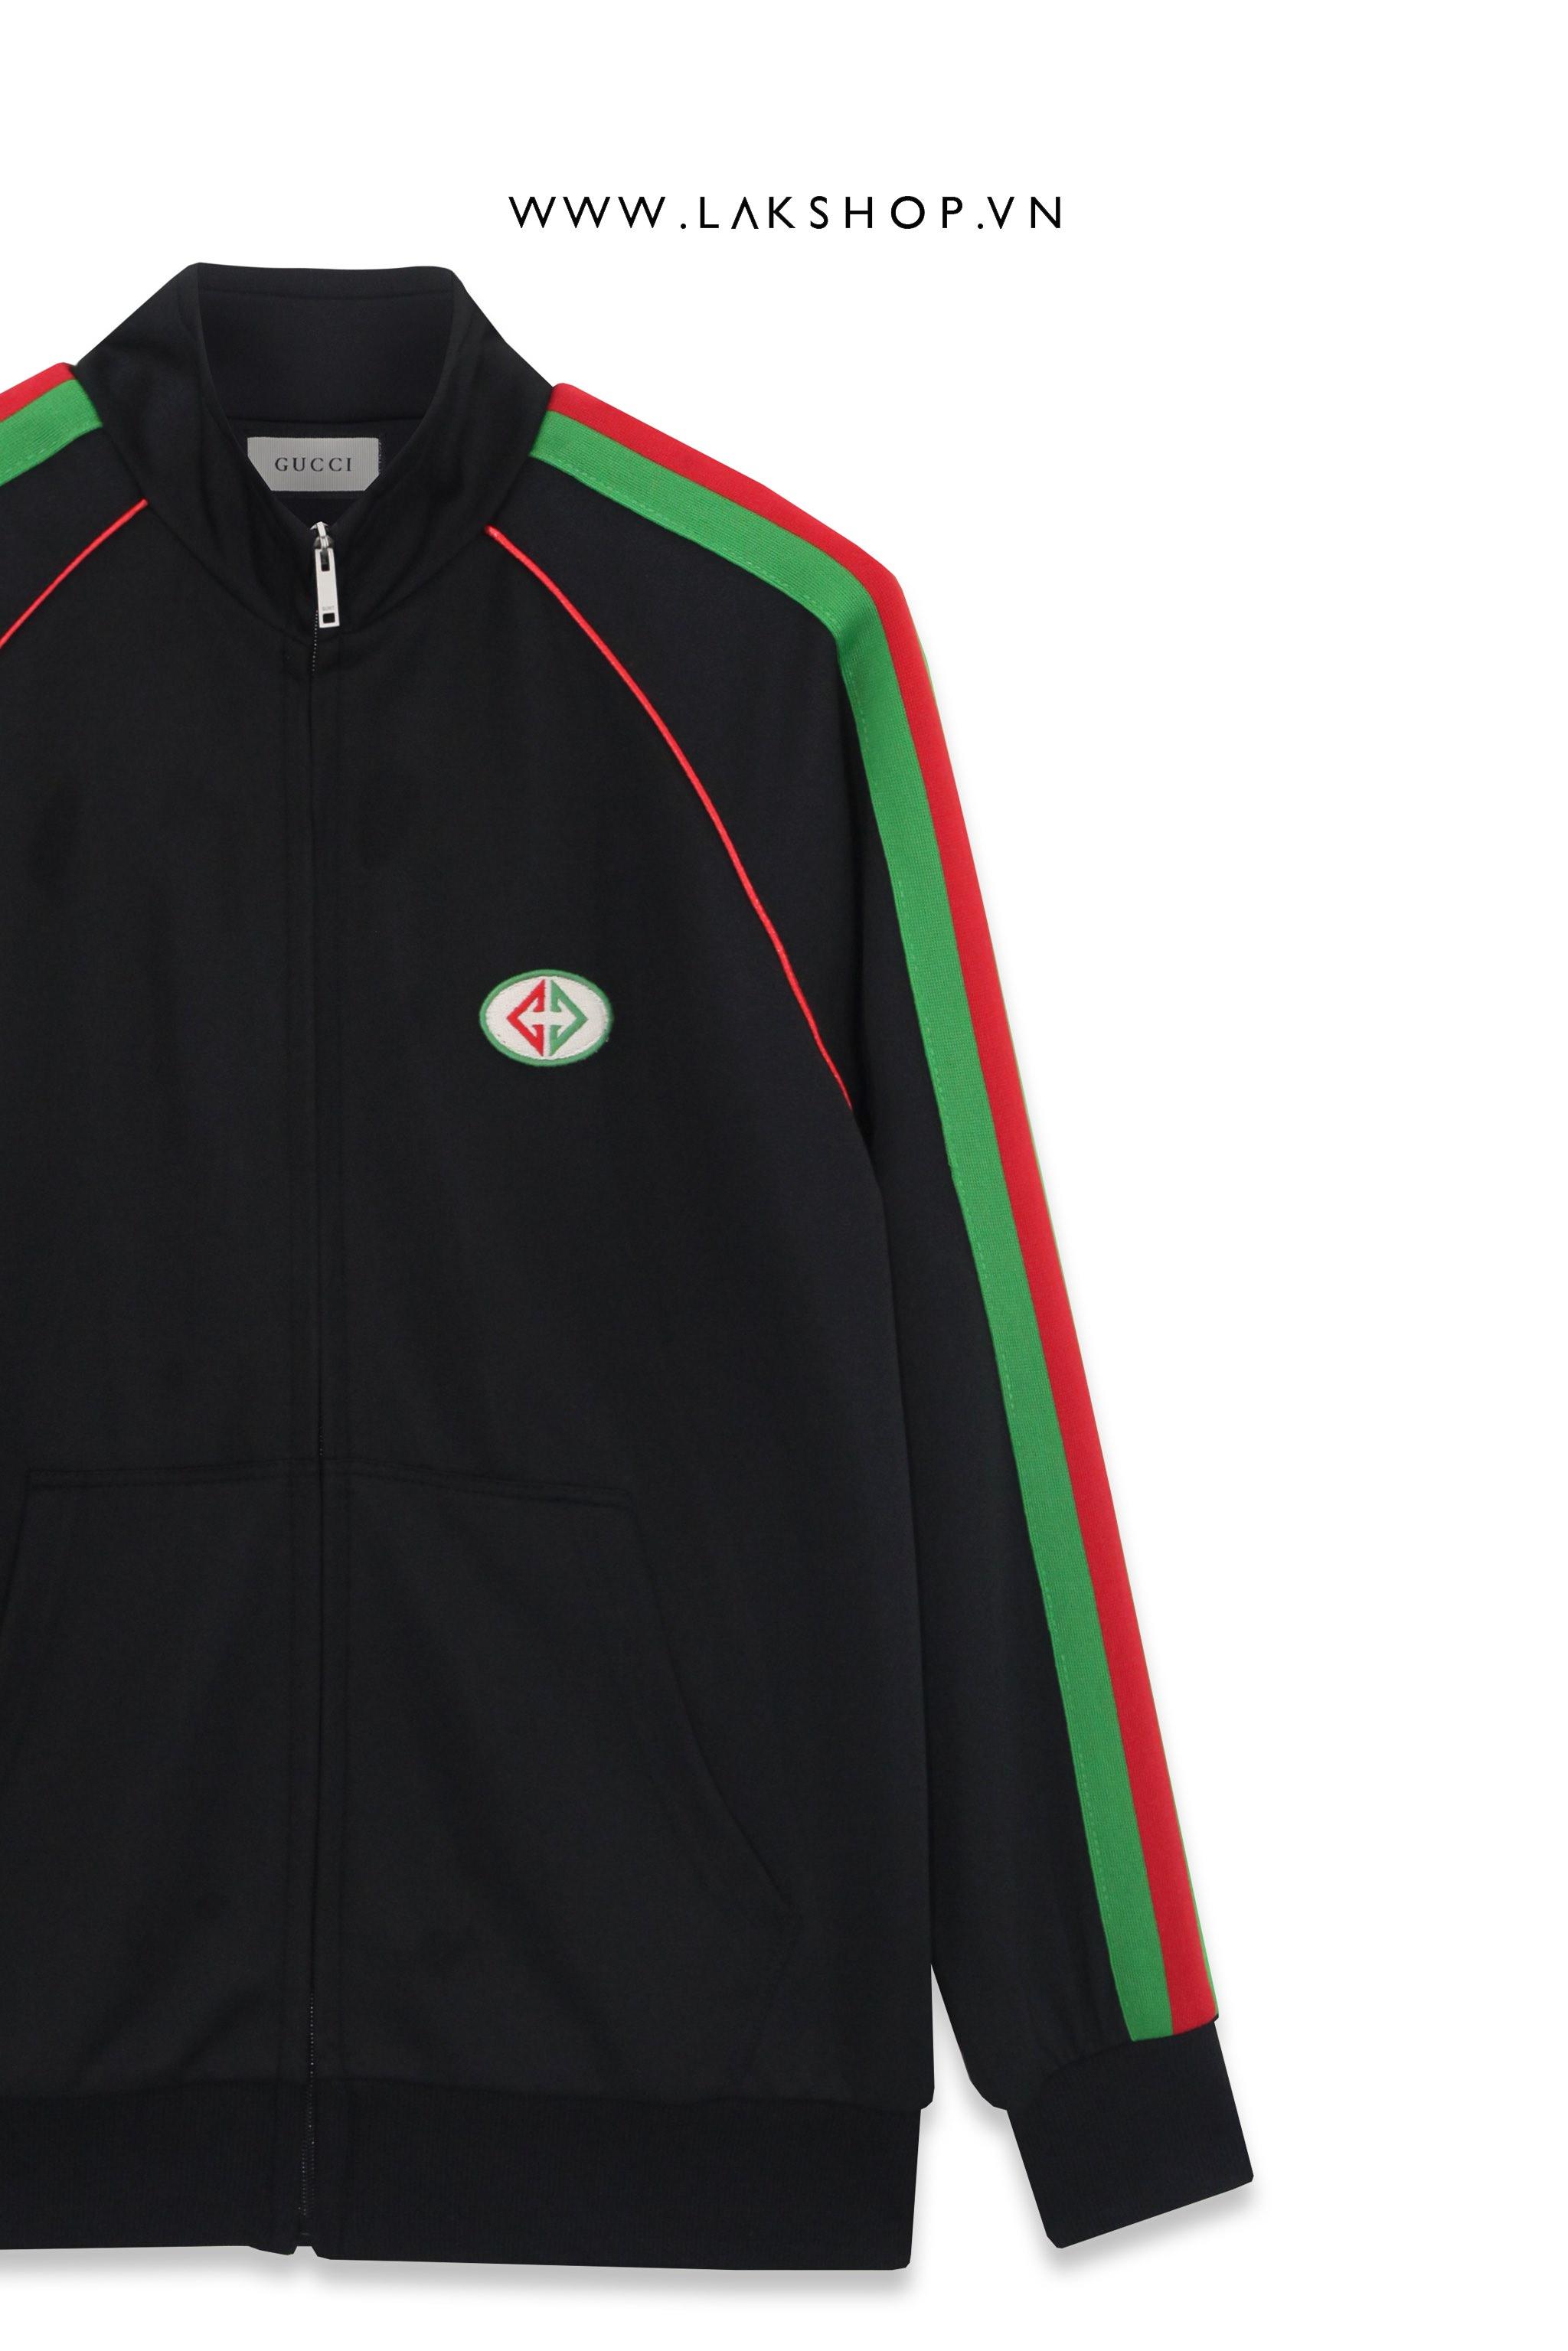 Gucci Black/Green Logo Track Jacket